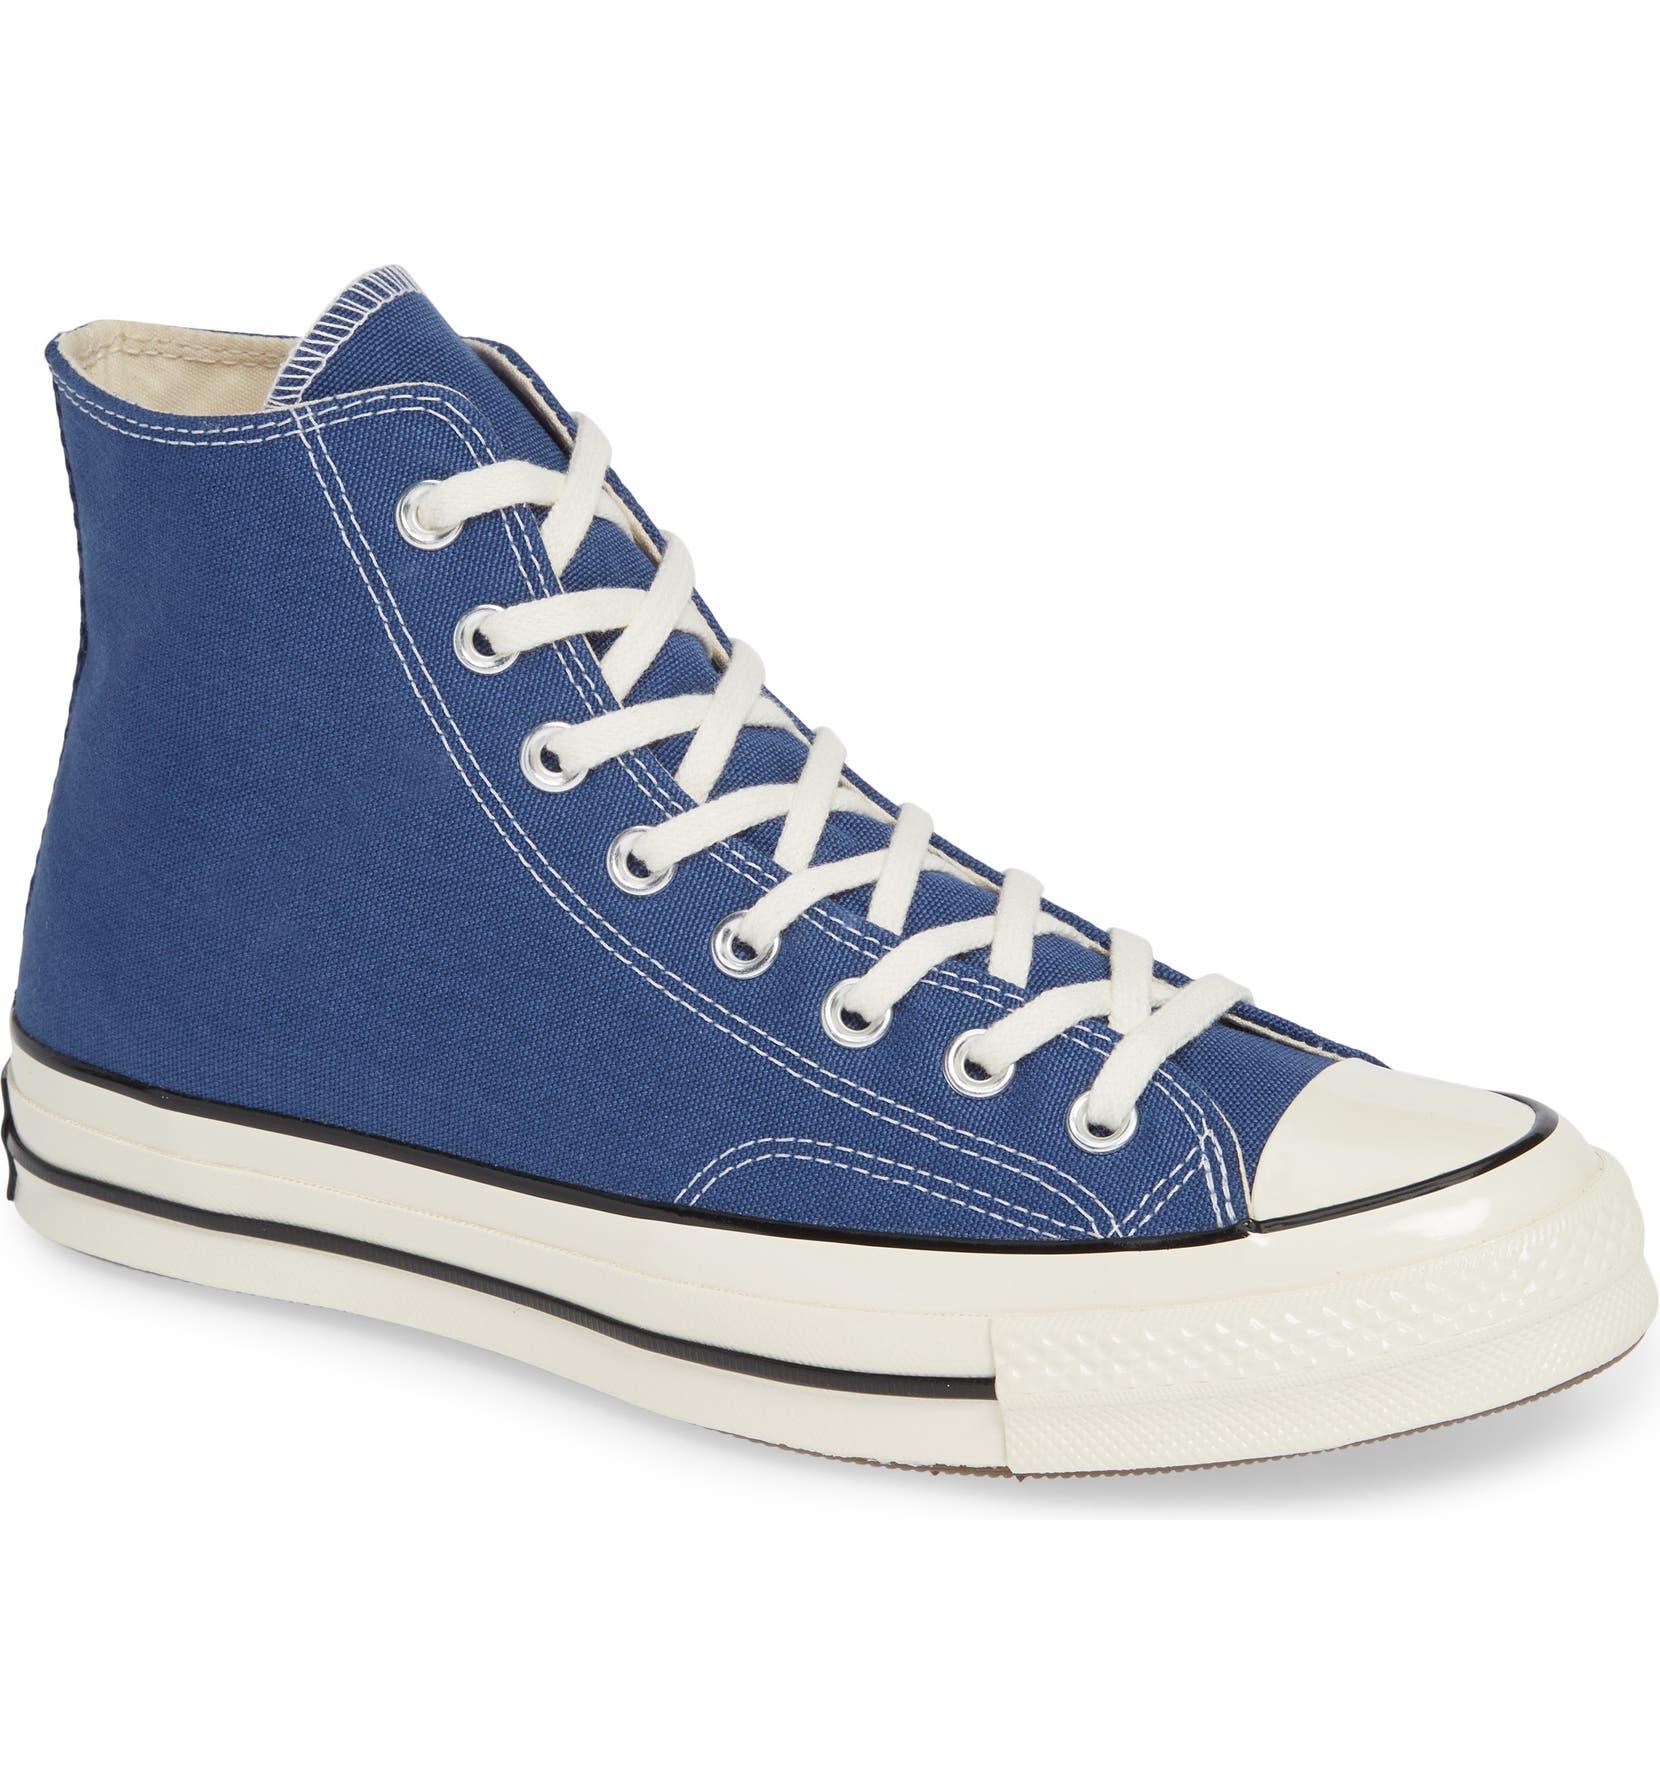 8654fb4f304 Converse Chuck Taylor® All Star® 70 Vintage High Top Sneaker (Men ...